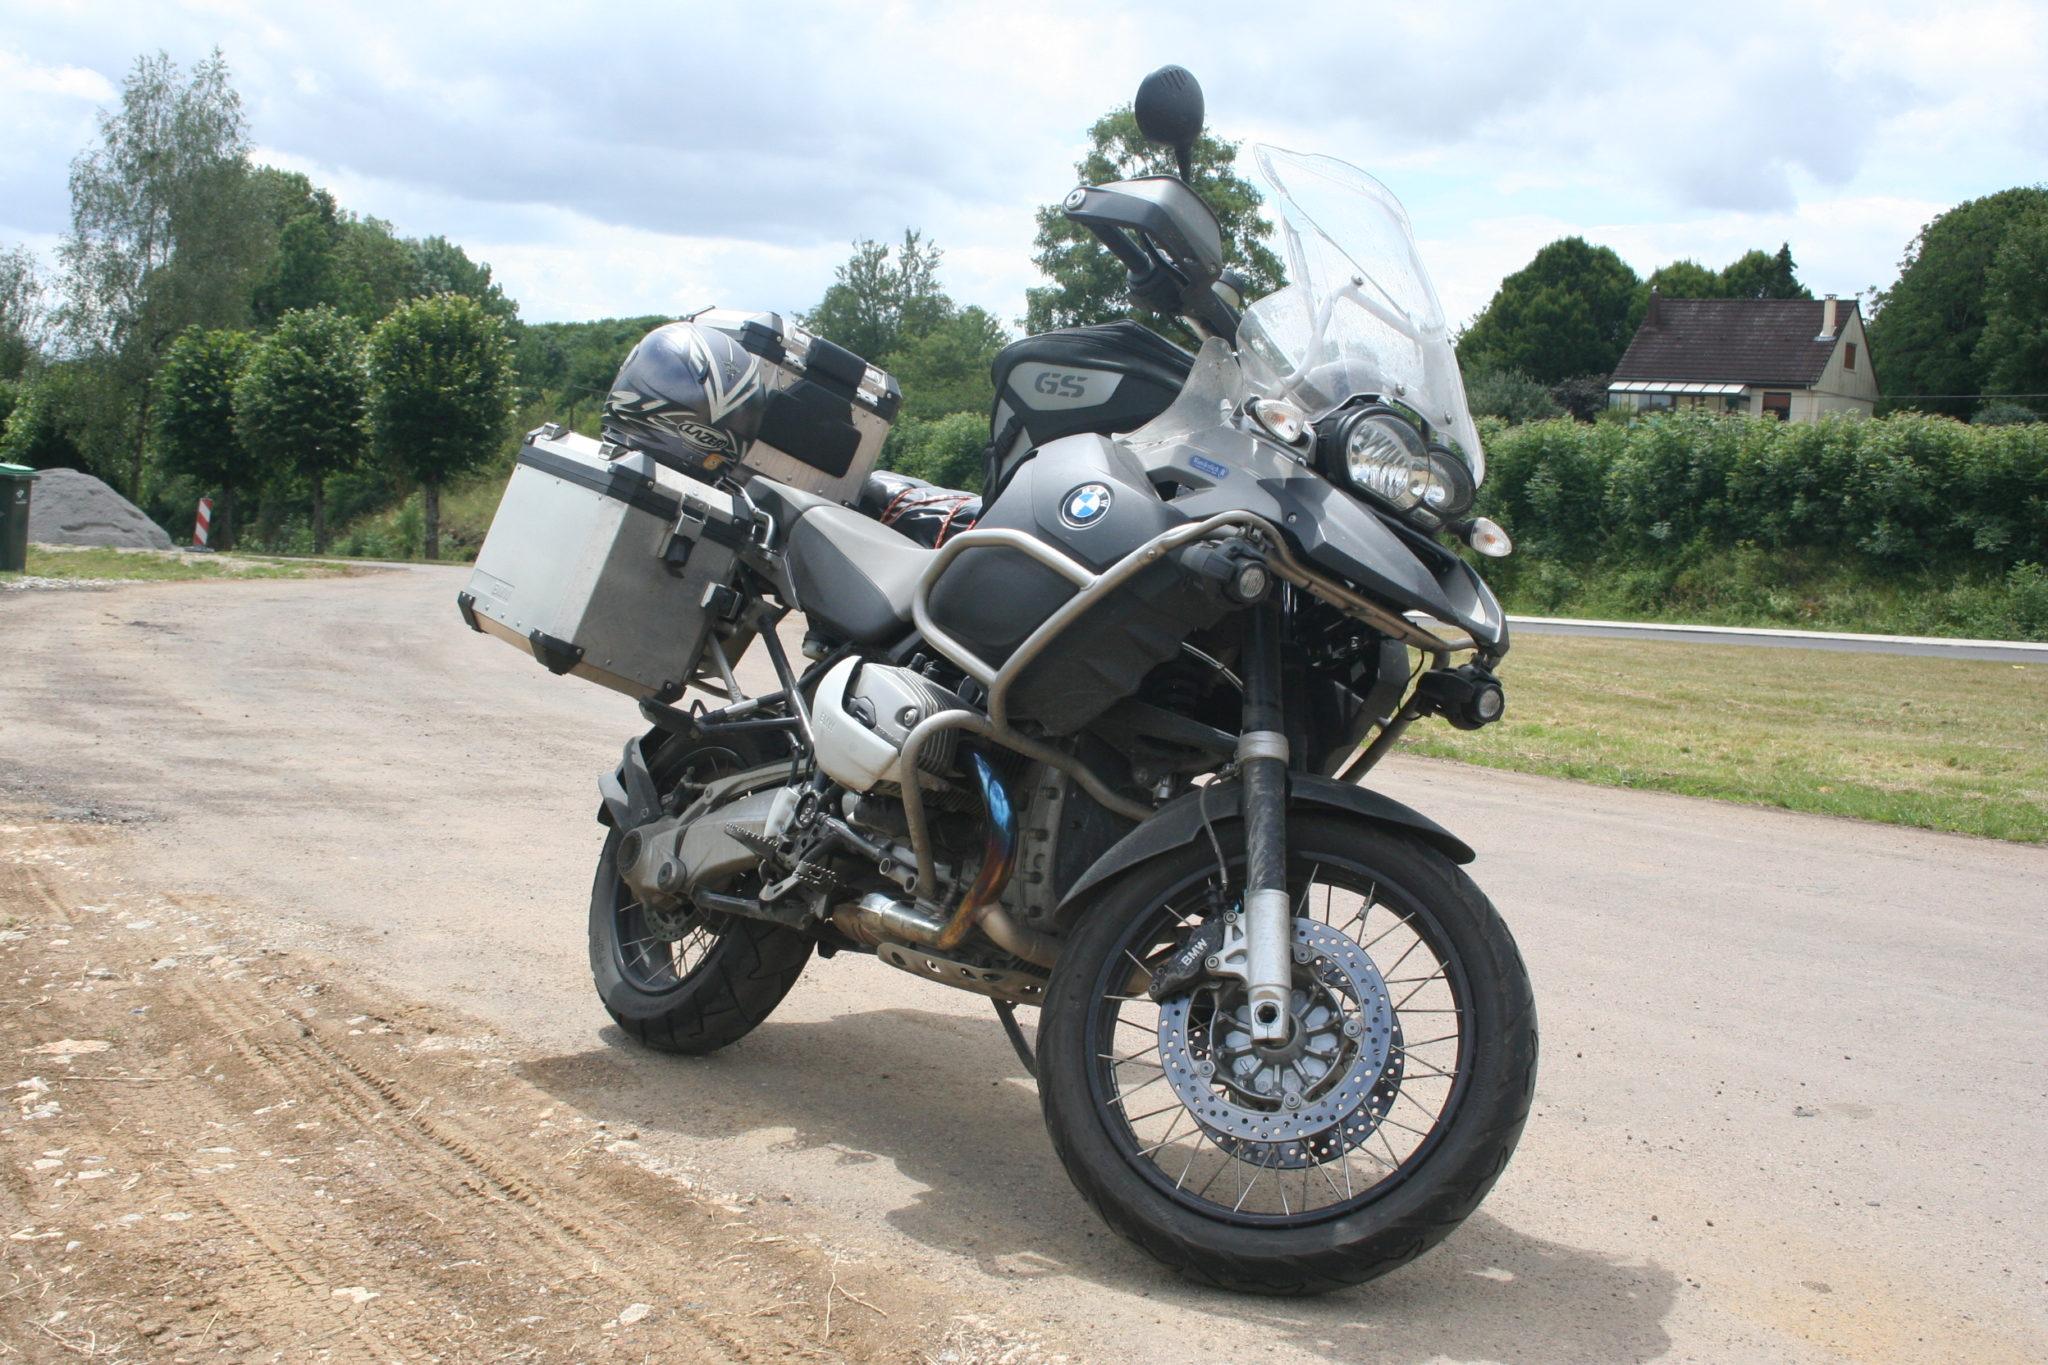 Nicu – BMW R1200GS Adventure